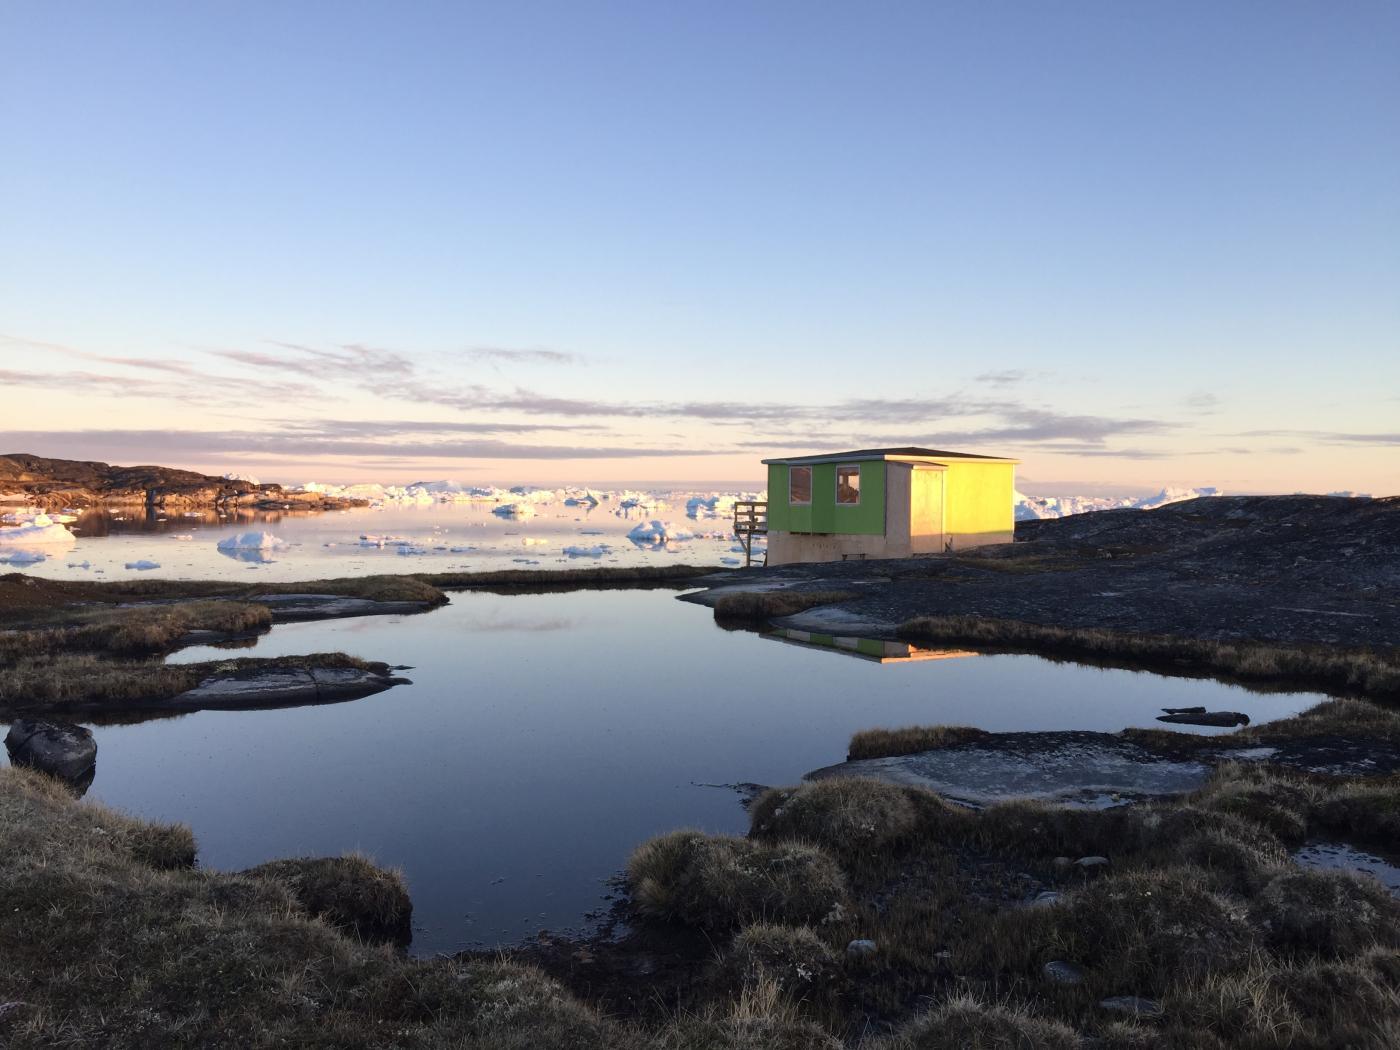 Sø og hytte - Photo by Ilulissat Guesthouse